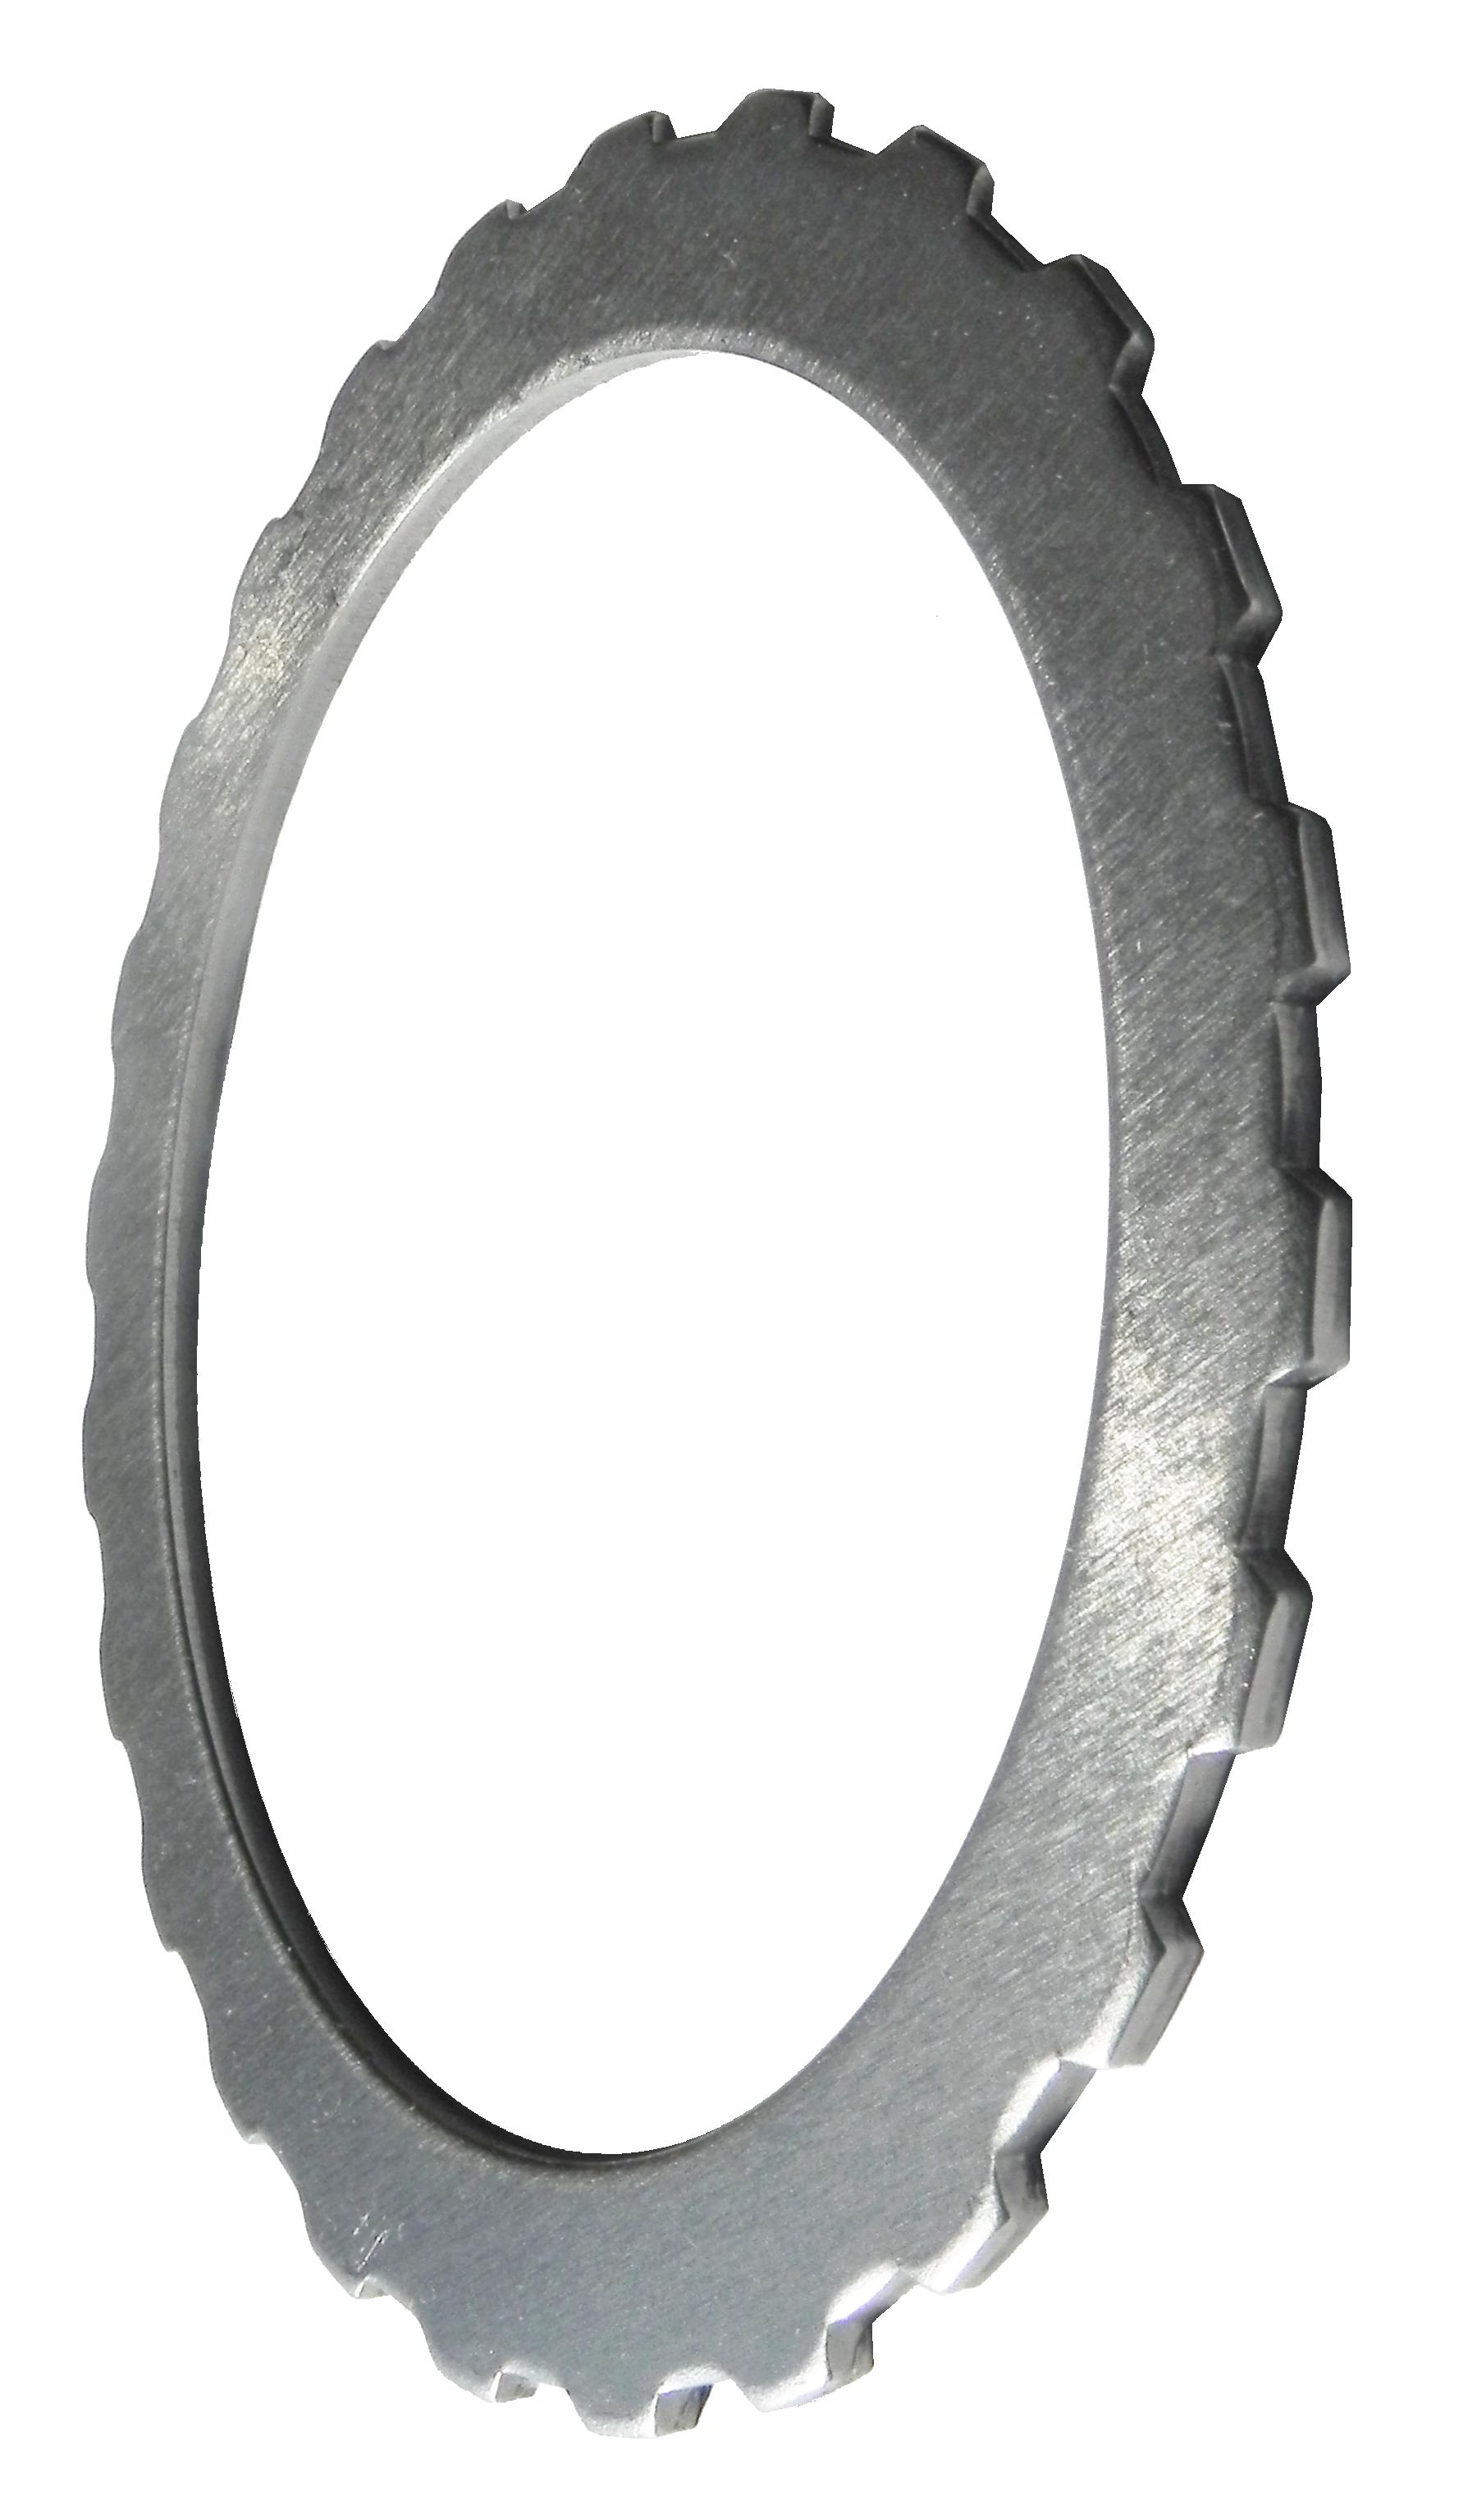 Steel Reaction Plate